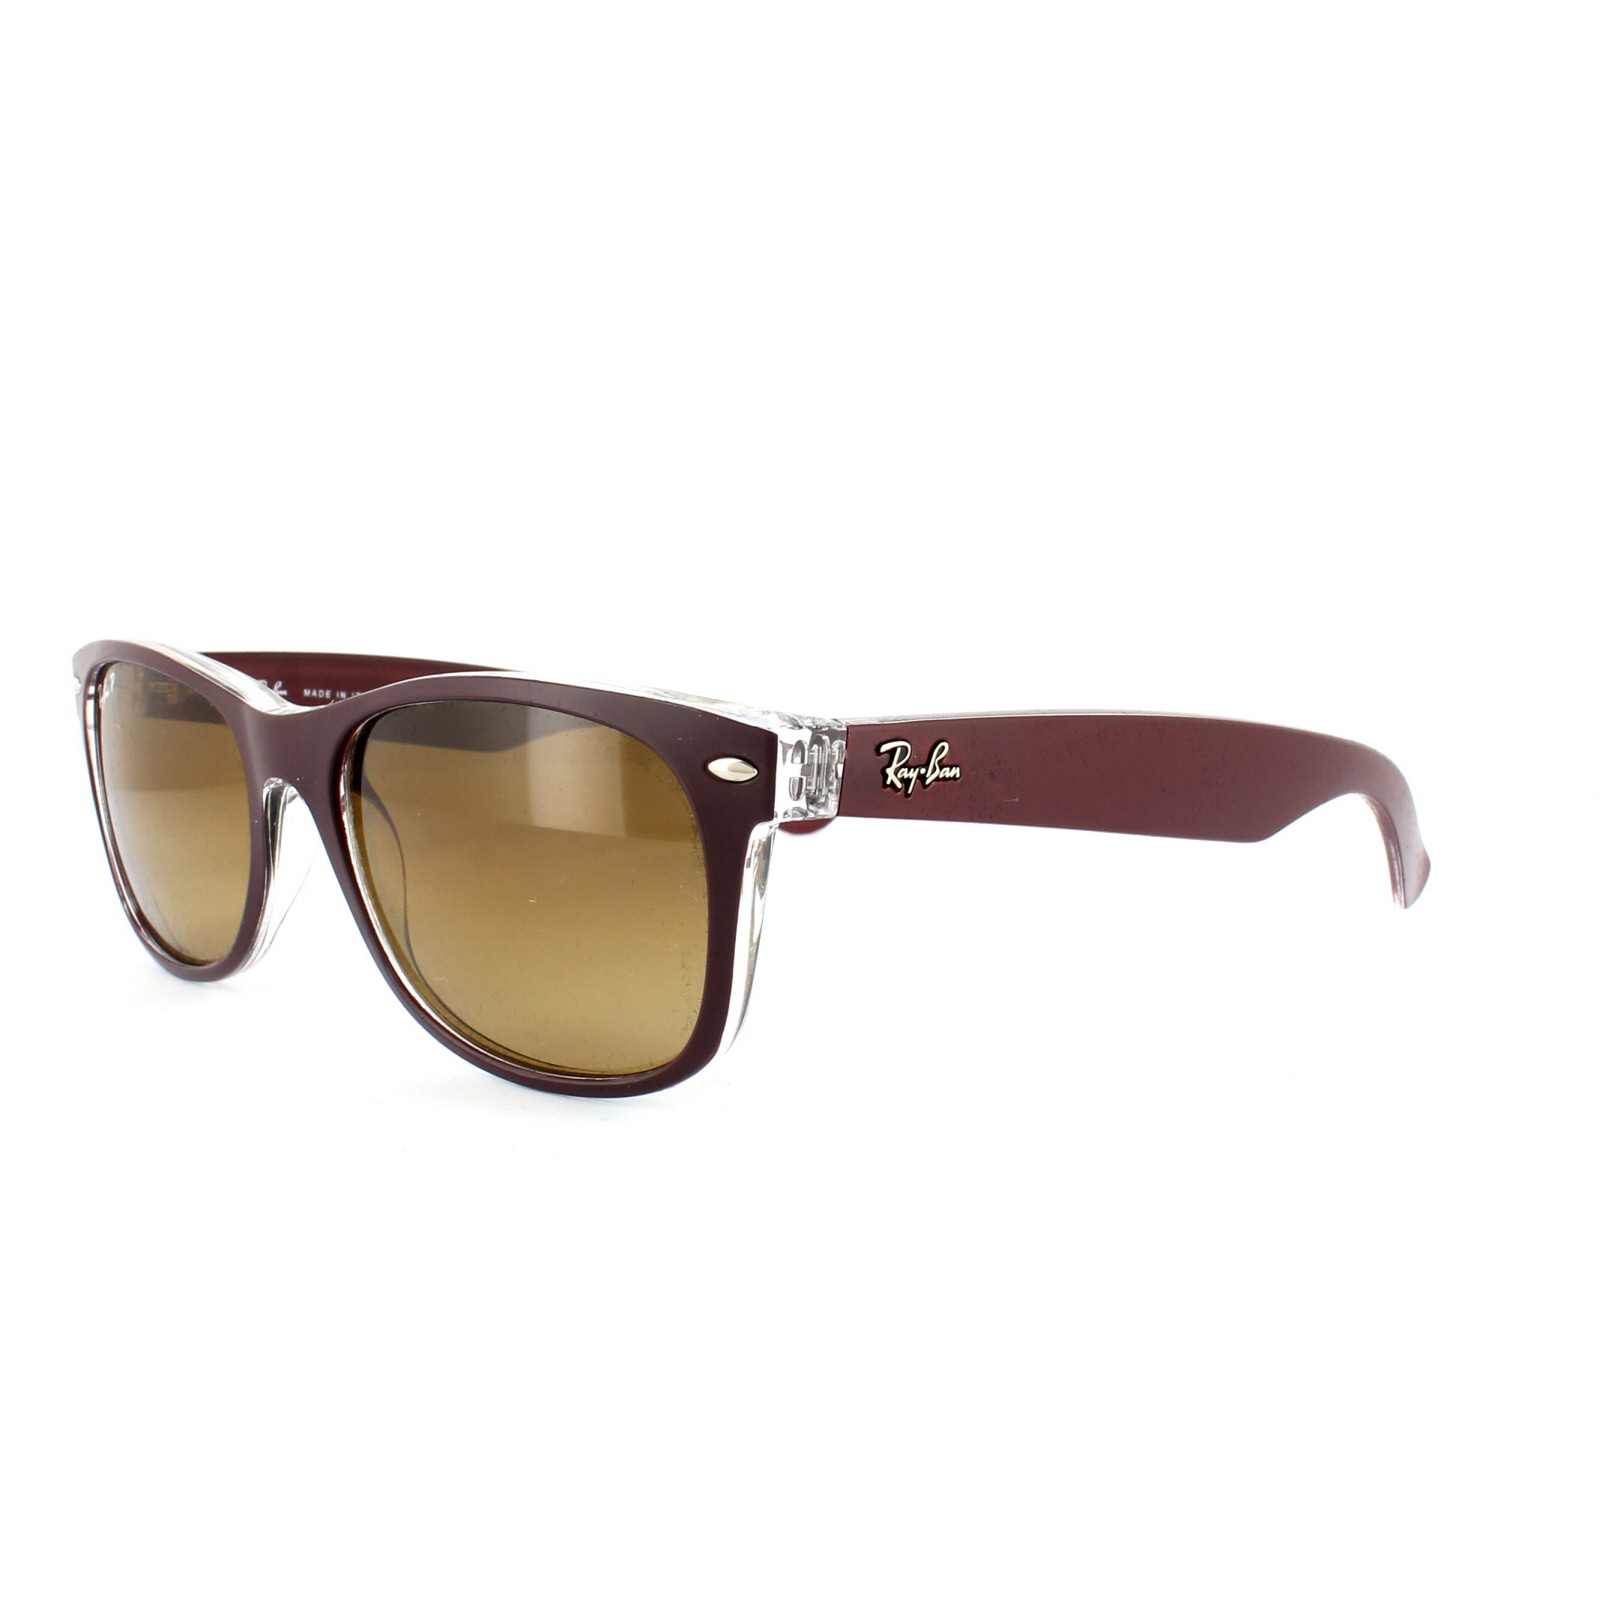 ray ban sonnenbrille braun rot